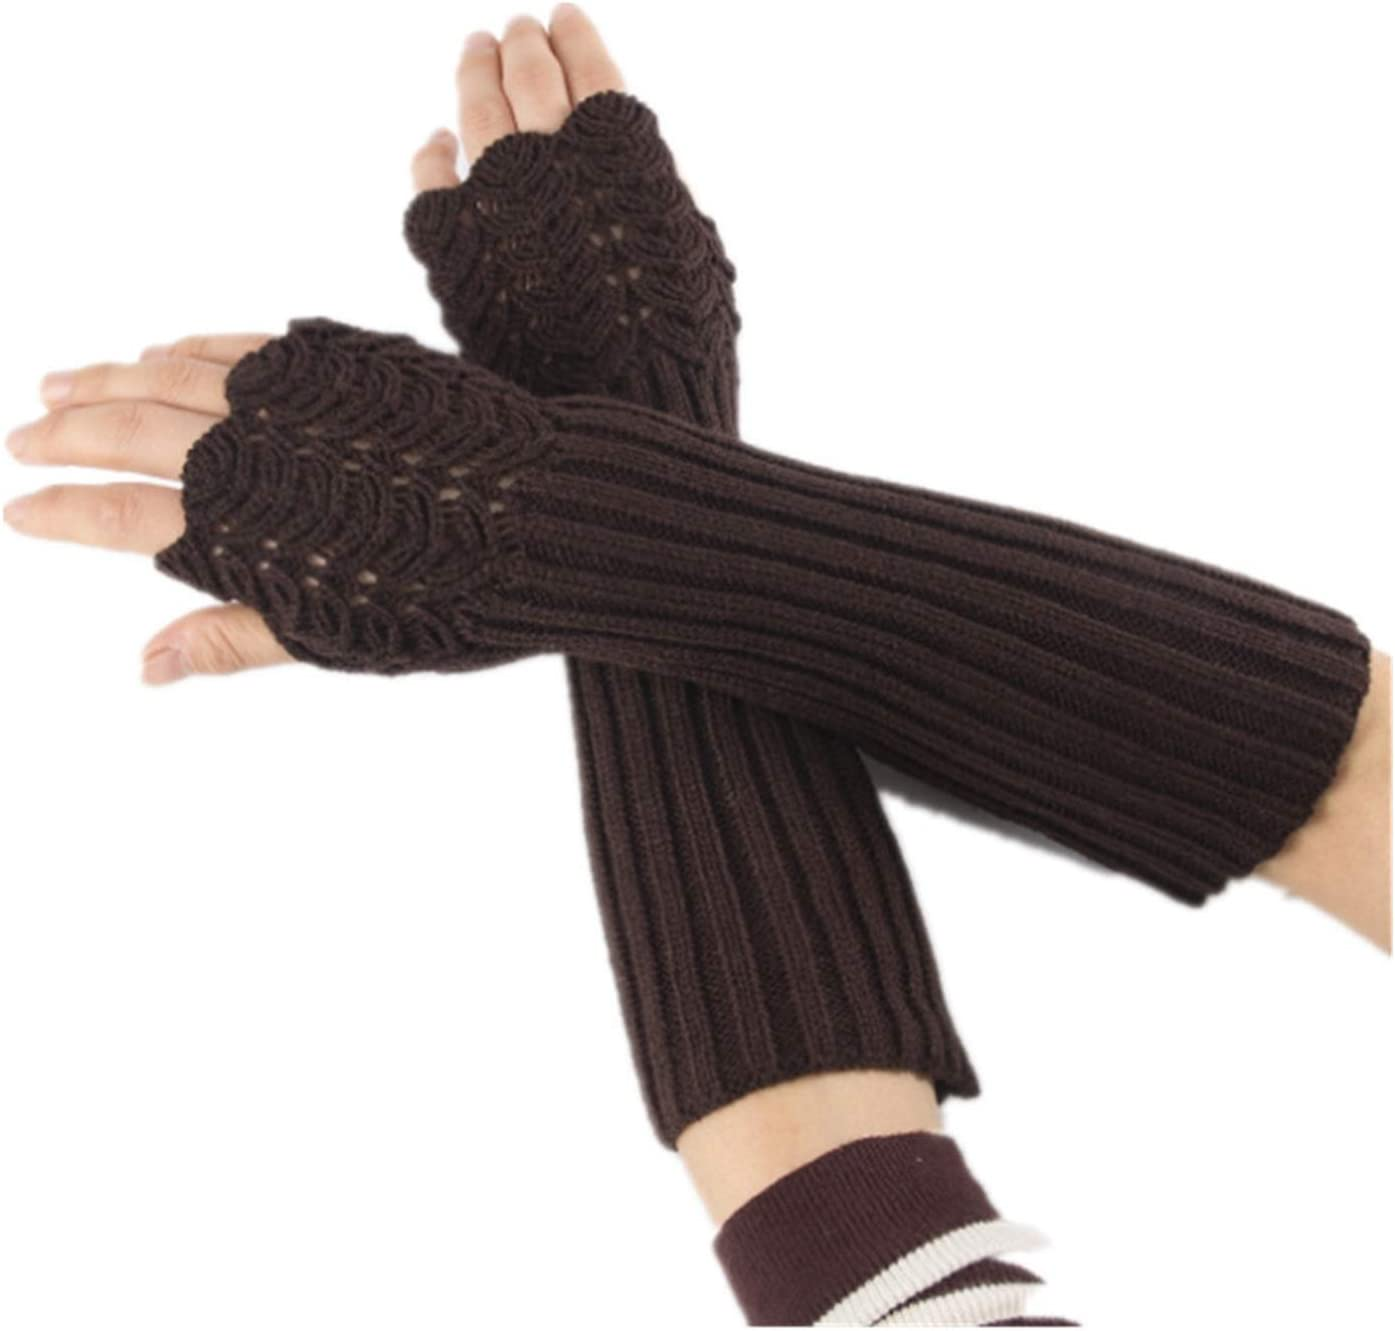 JSJJAWS Winter Gloves Unisex Men Ladies Fingerless Gloves Winter Warm Soft Knitted Mittens (Color : Dark Brown)